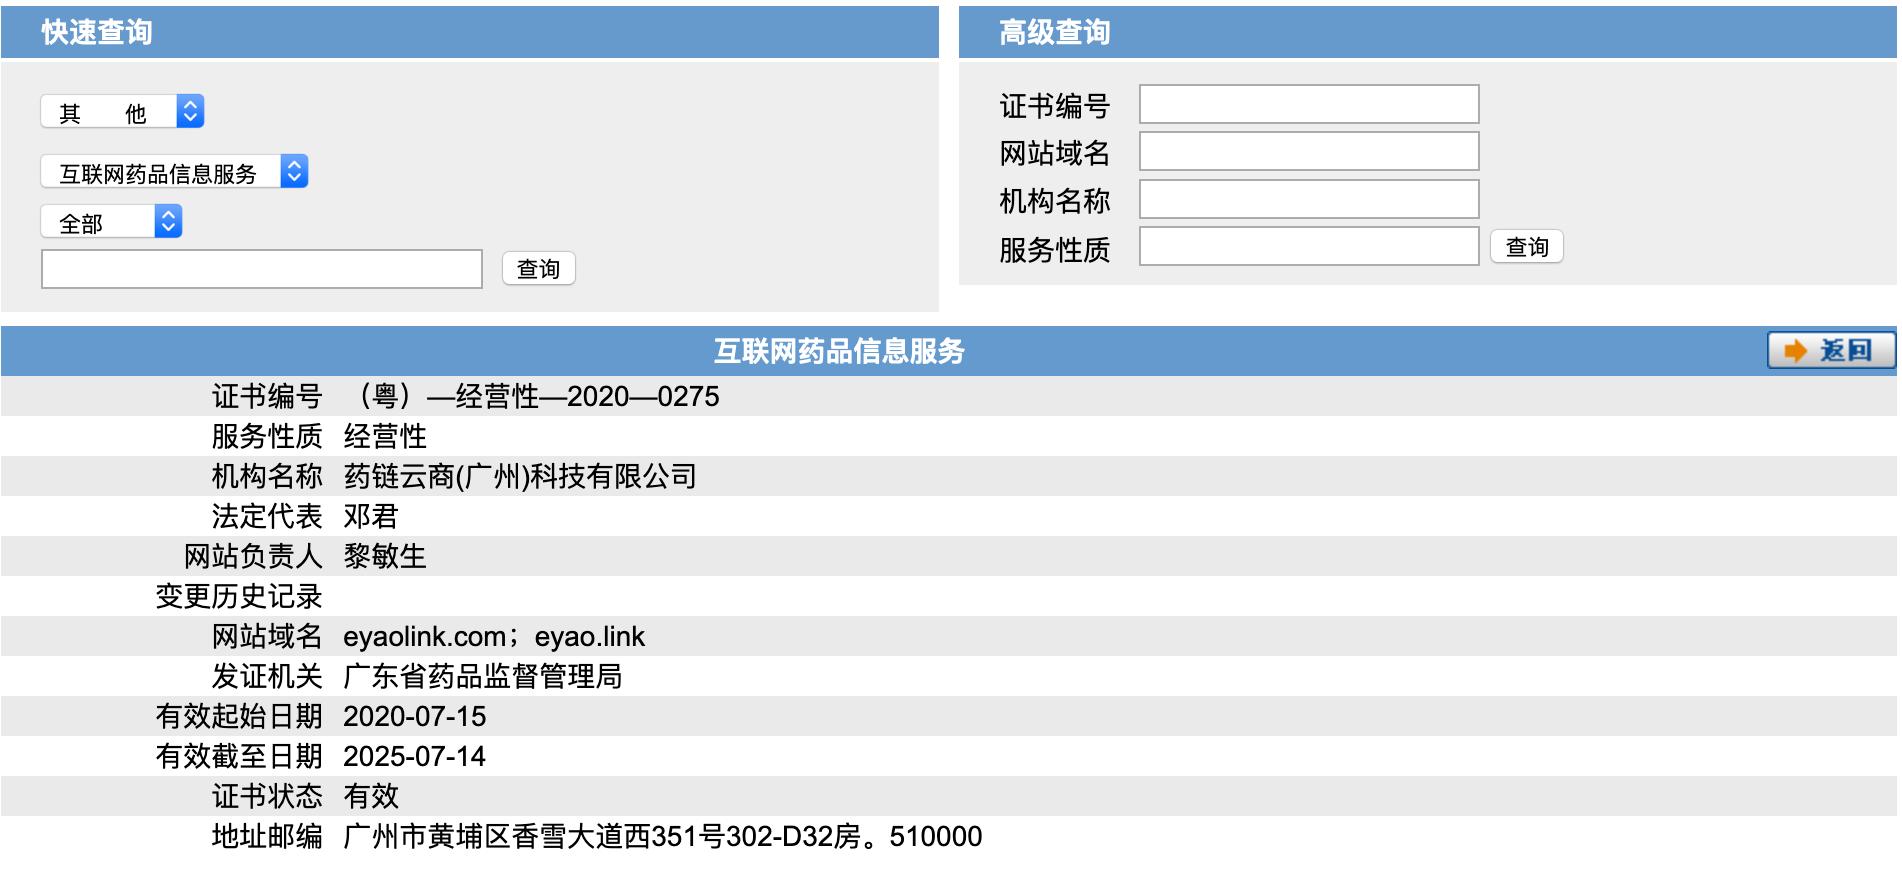 Screenshot_2020-10-29 国家药品监督管理局--数据查询的副本.png